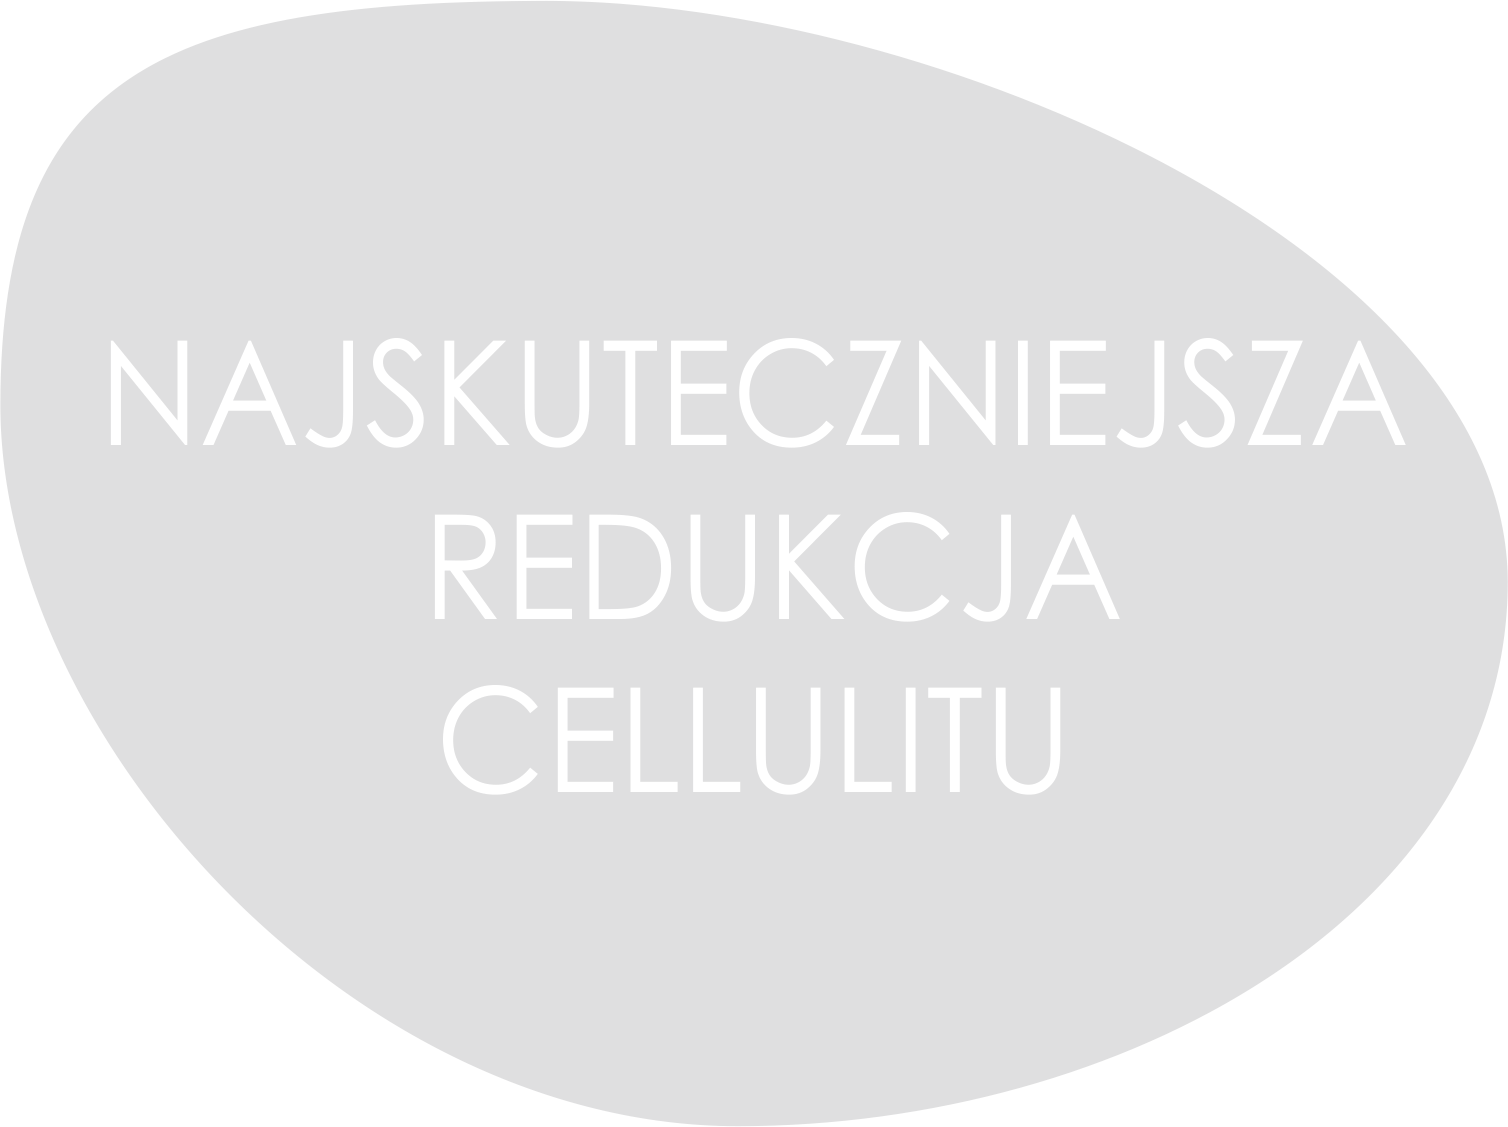 REDUKCJACELULITU